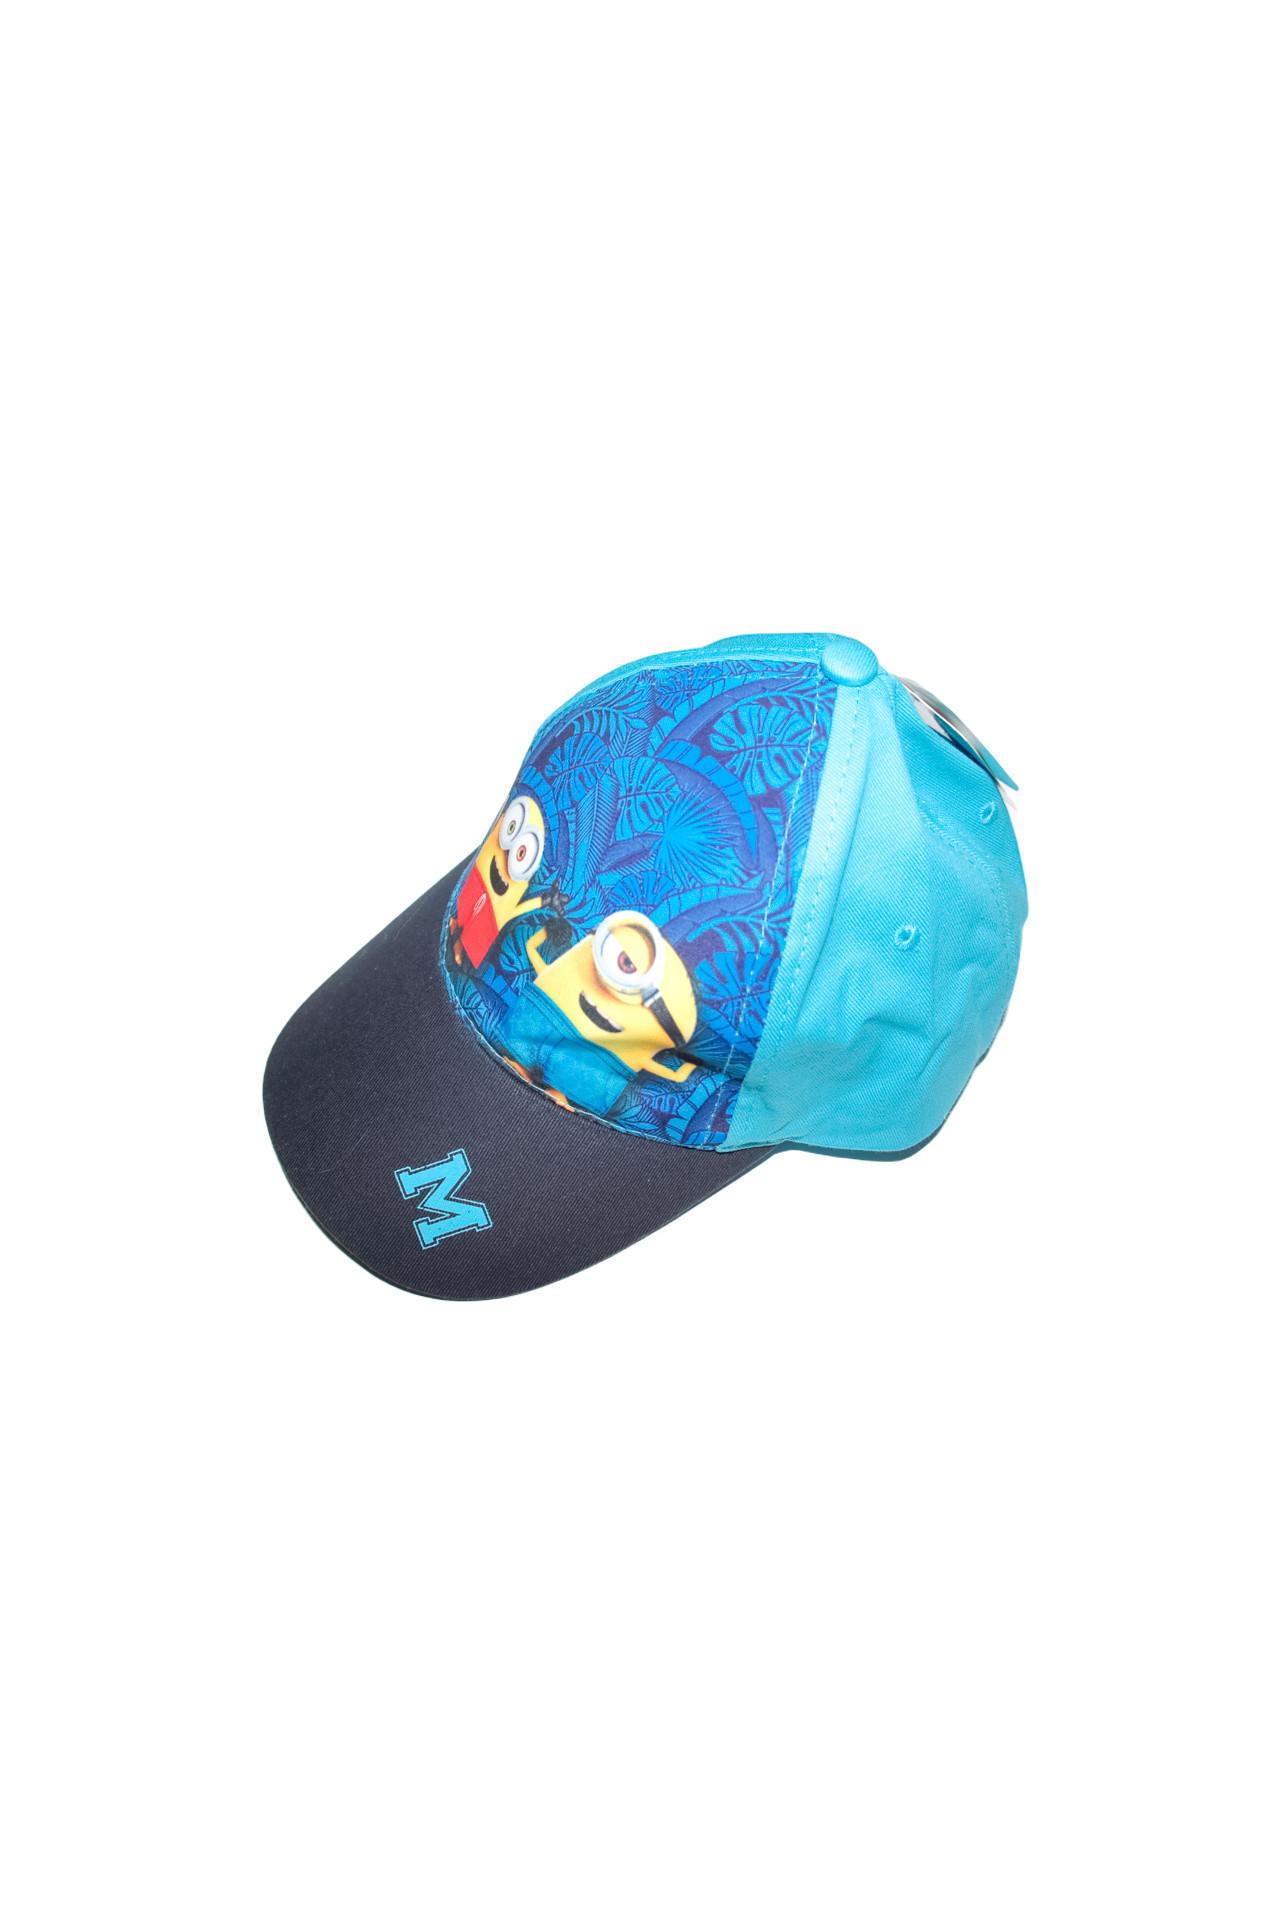 Hat 52-54cm - 1